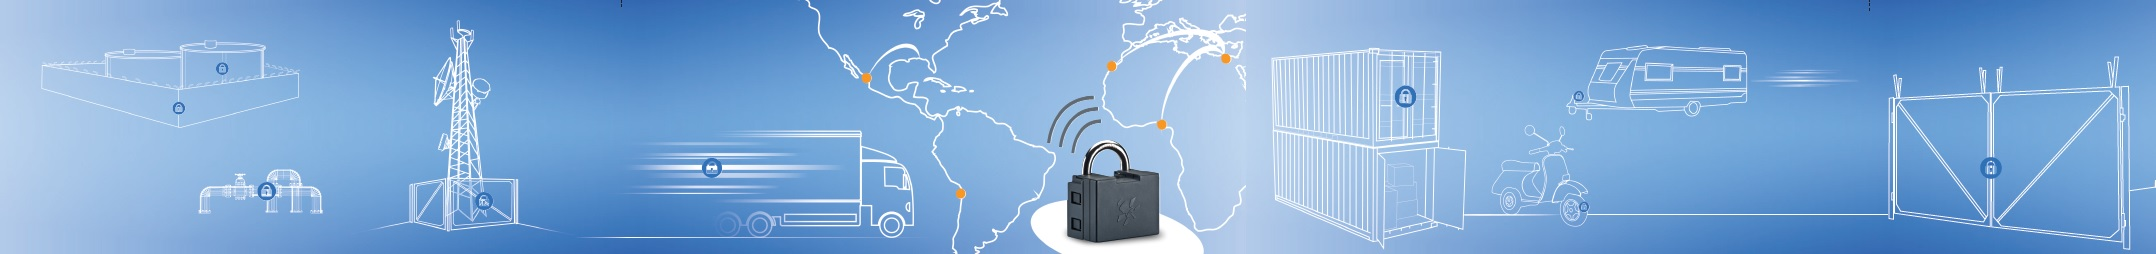 gps padlock electronic alarm system